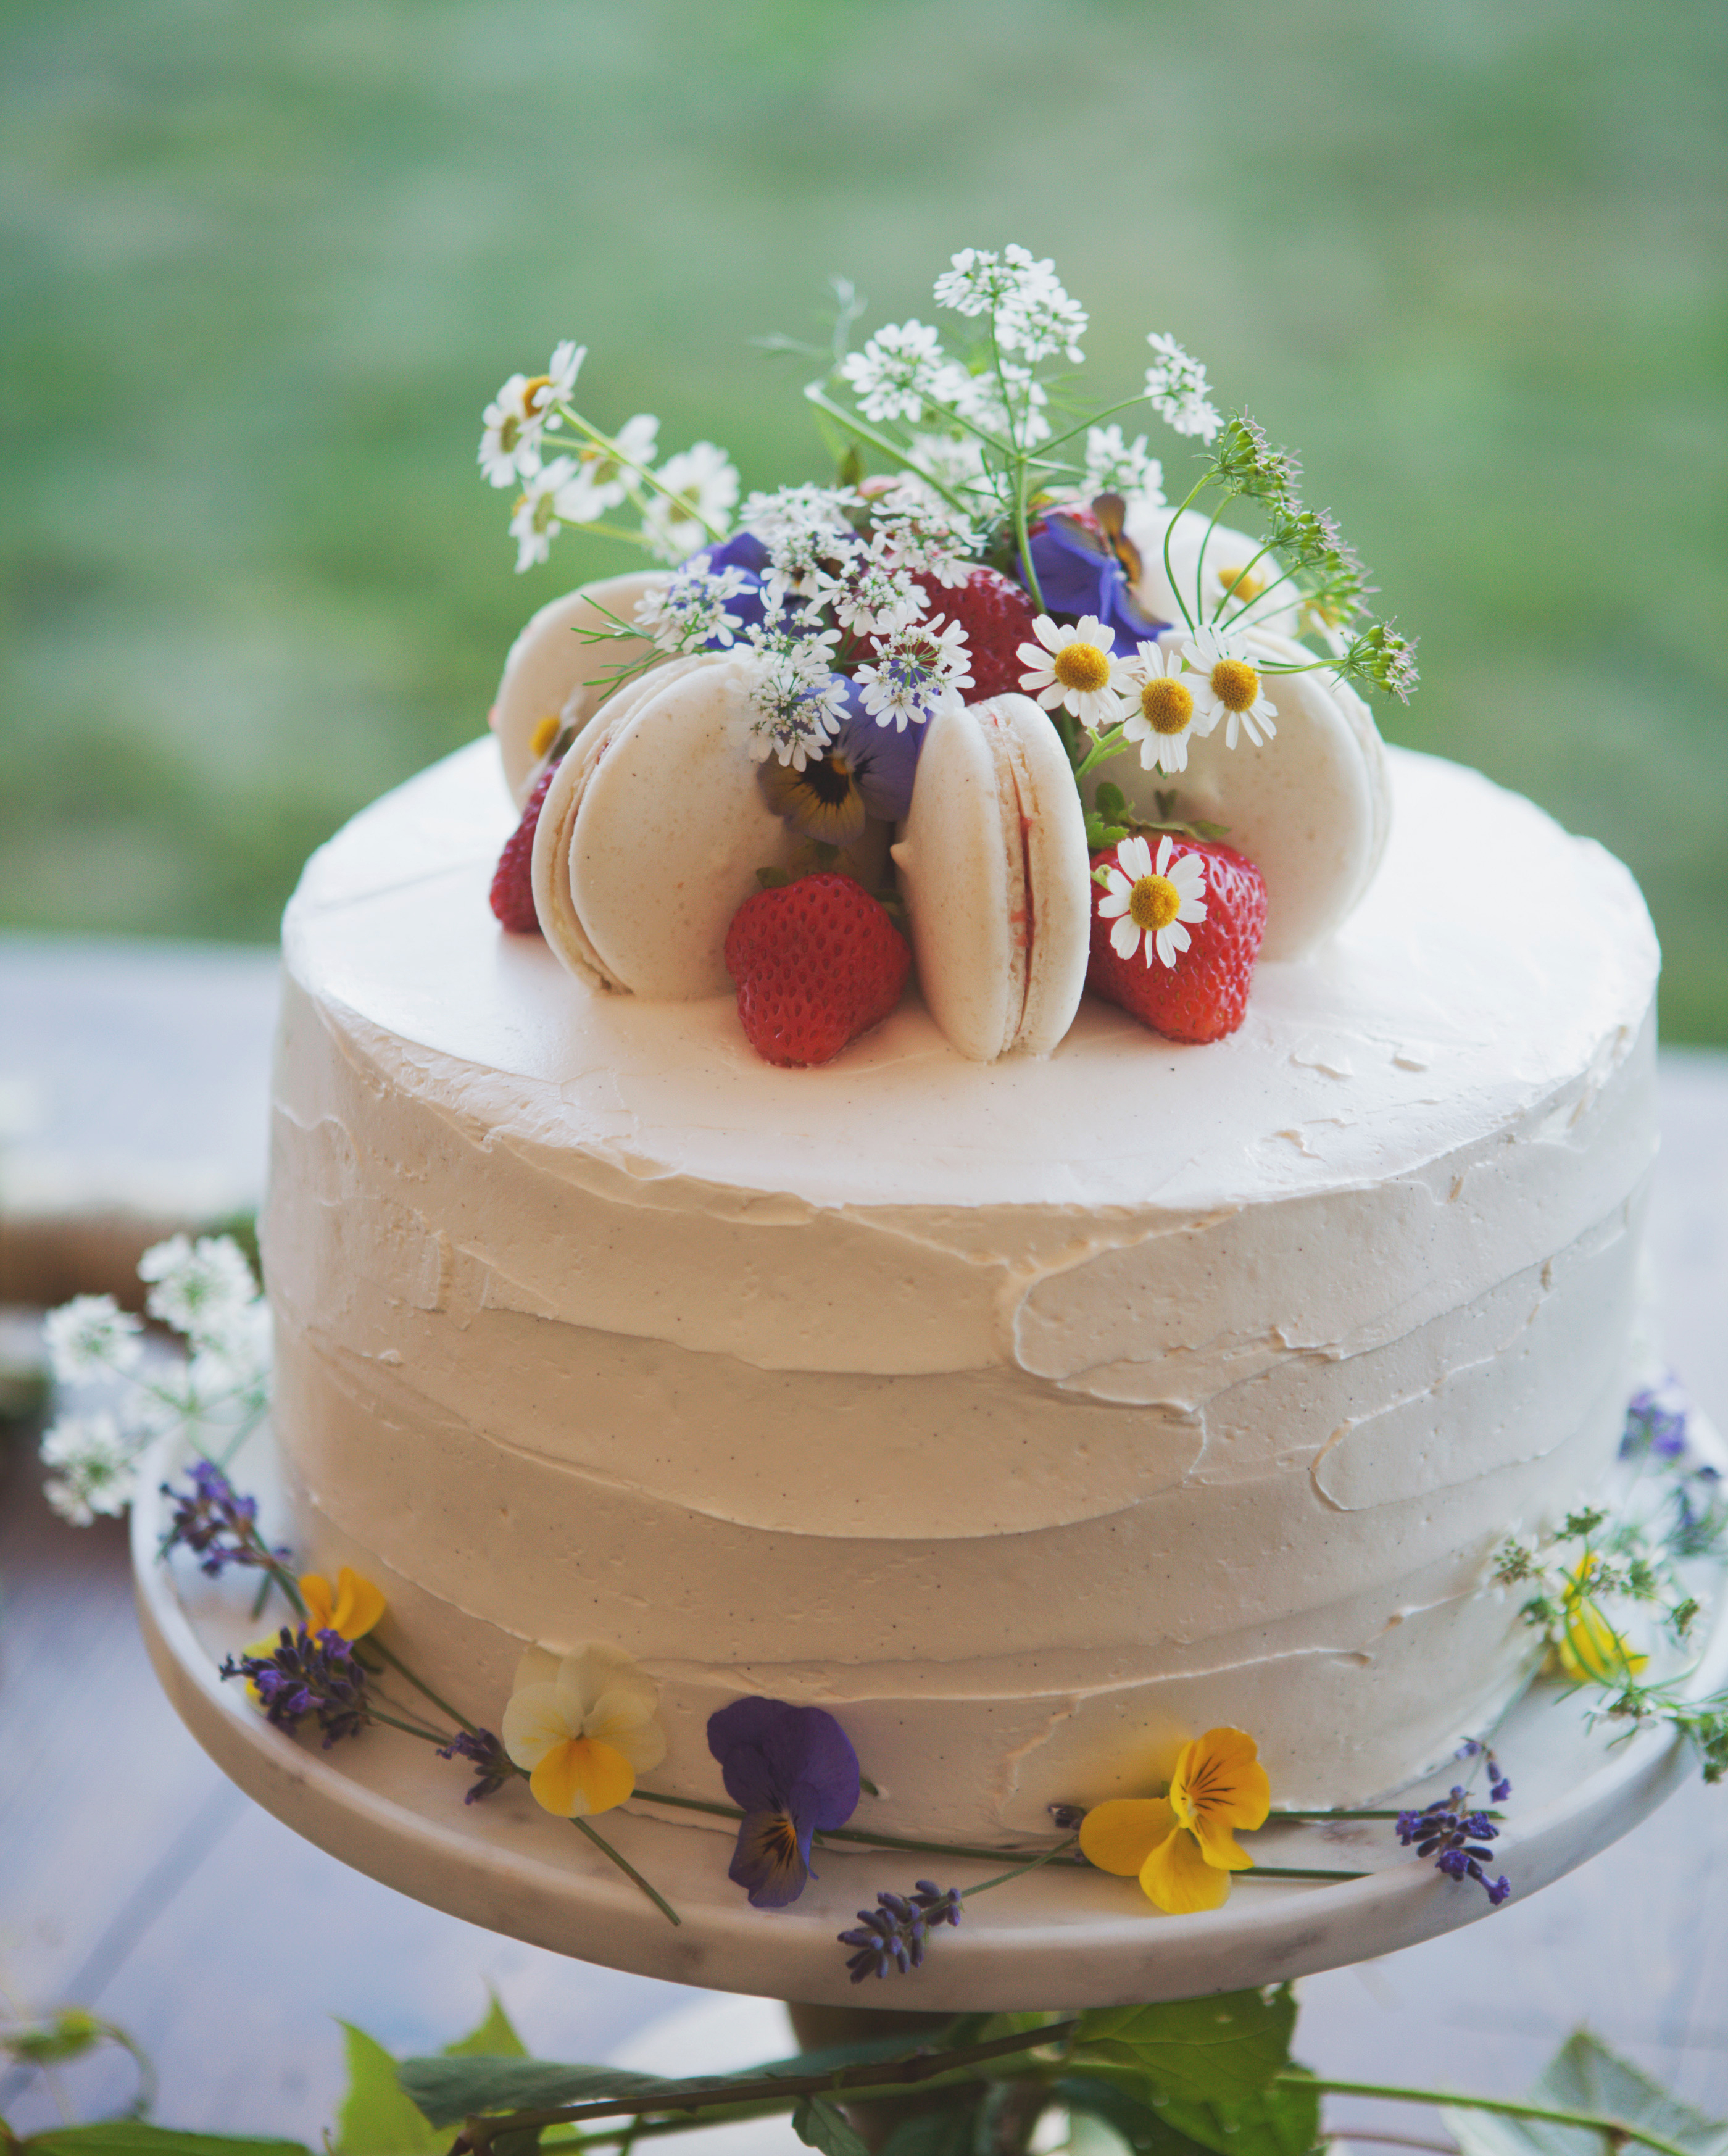 lilly-carter-wedding-cake-00549-s112037-0715.jpg